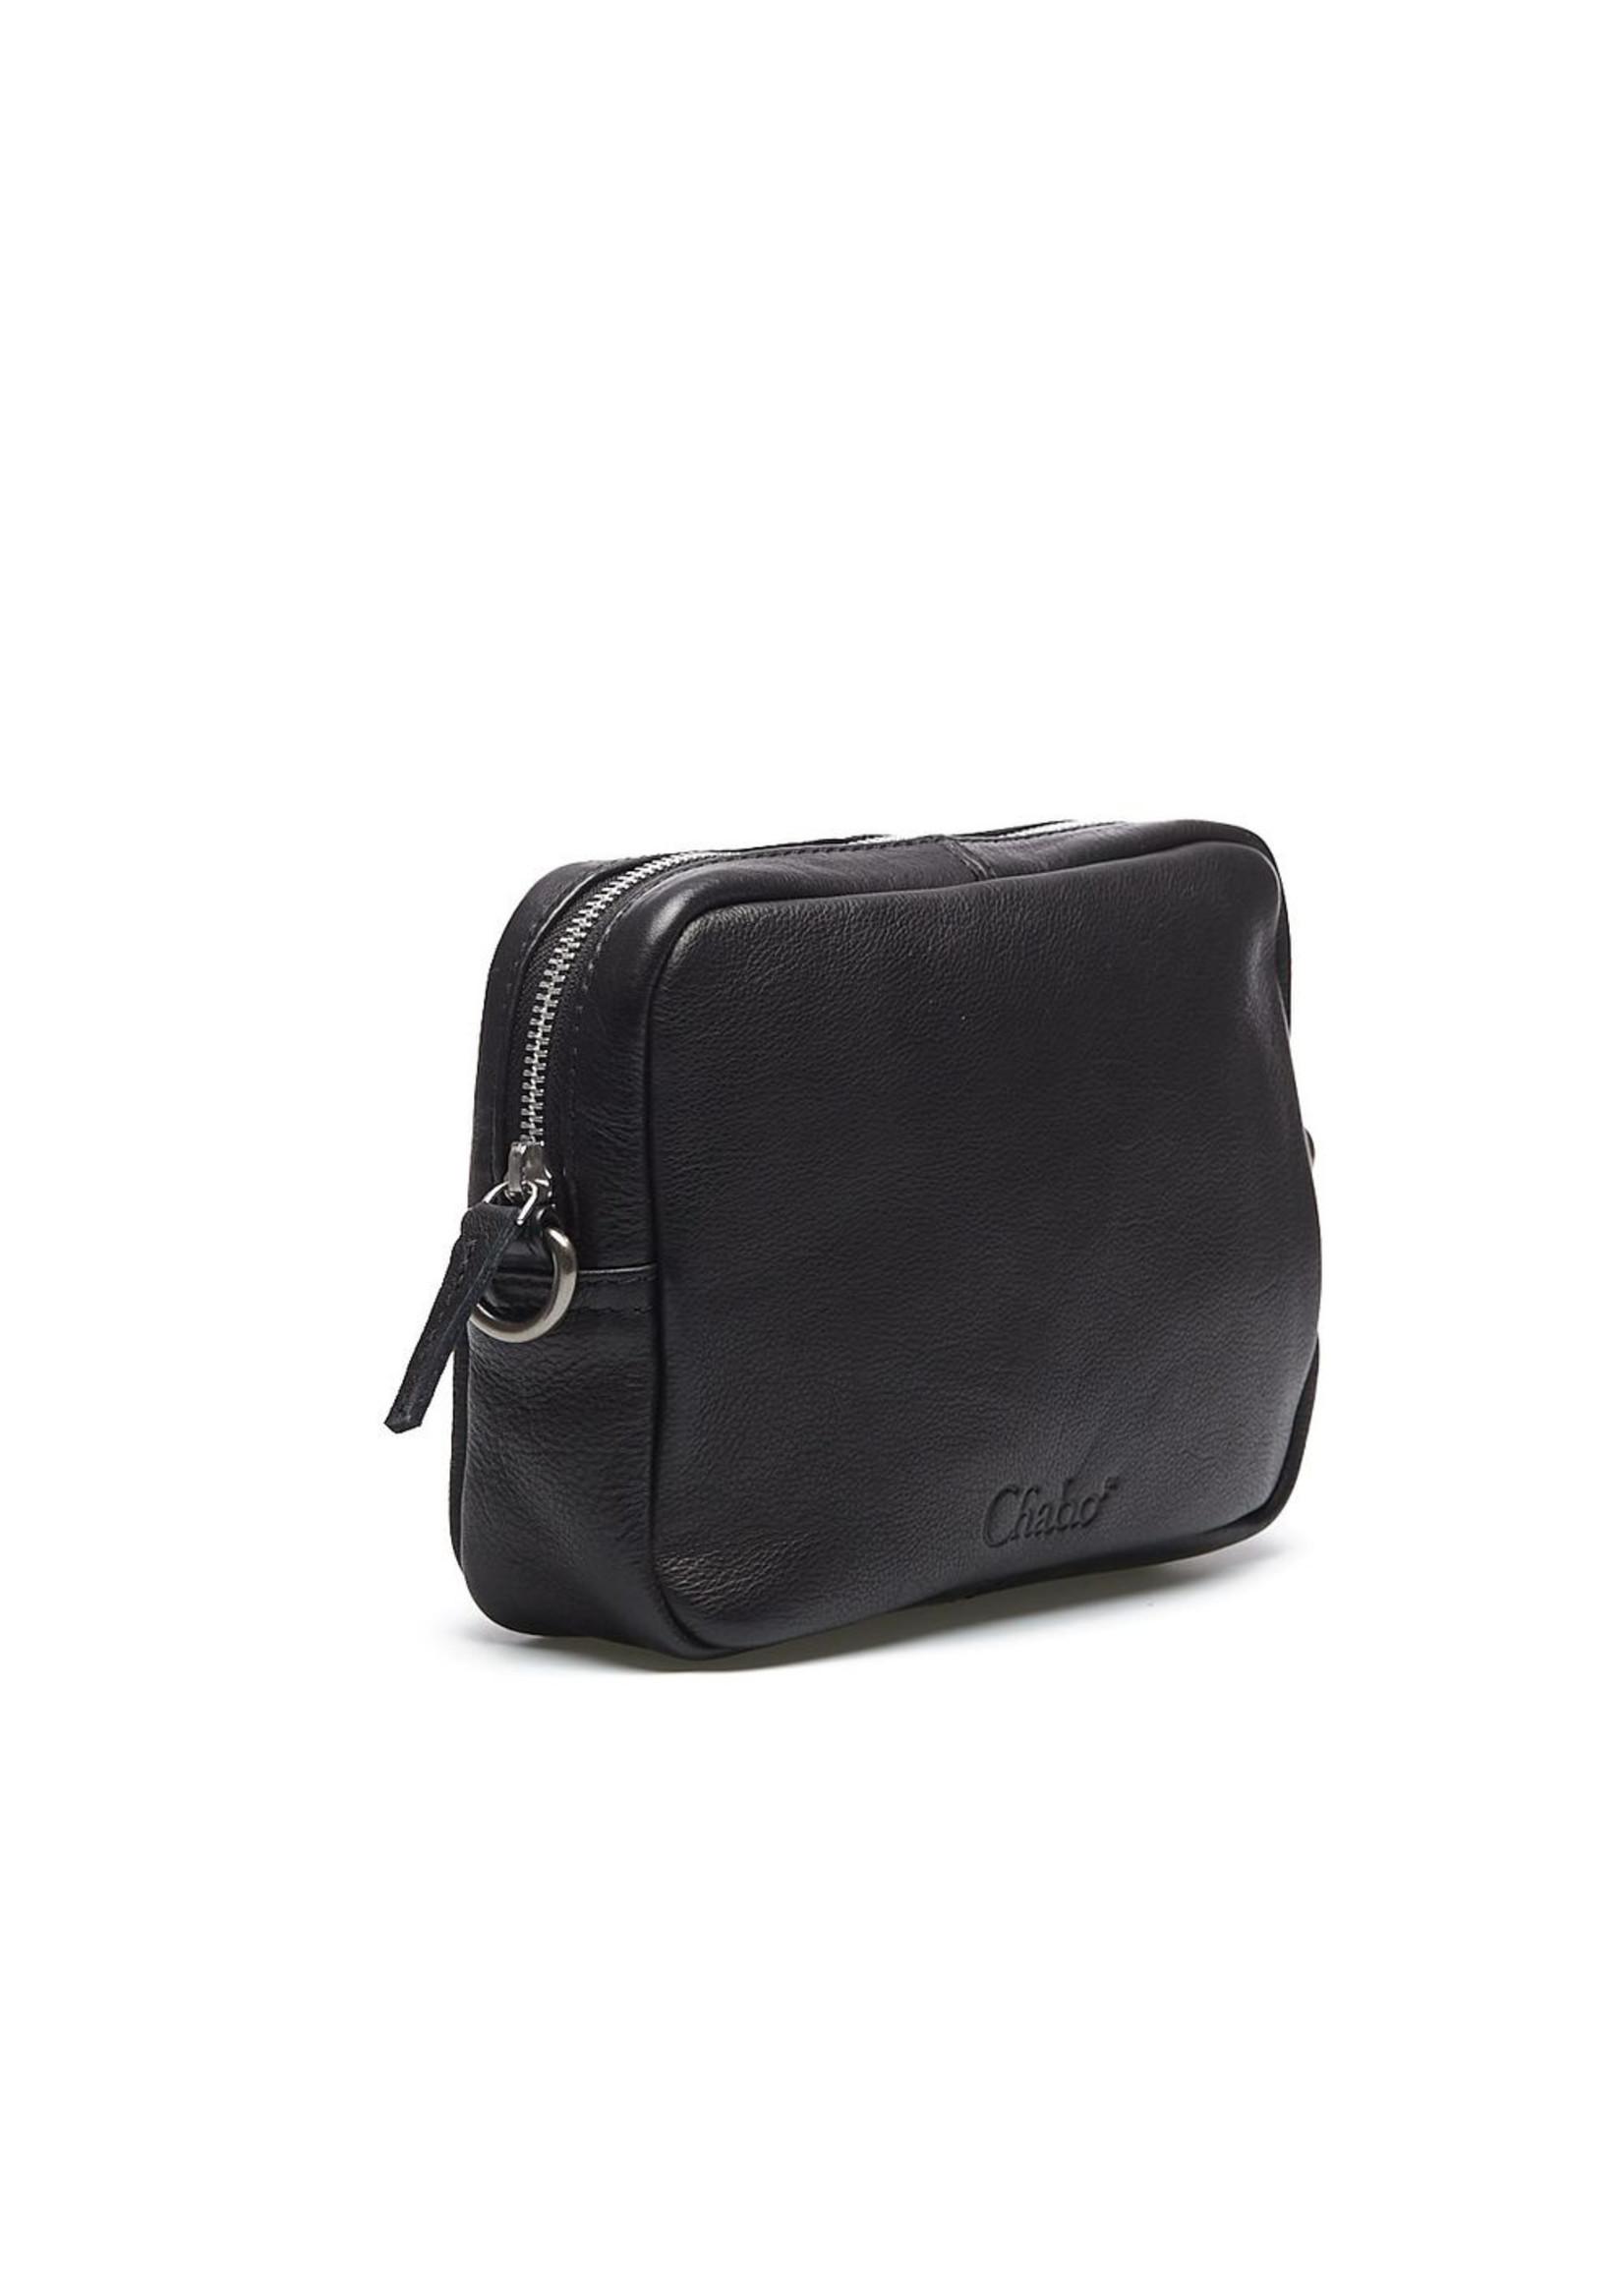 Chabo Bags Iggy Silver Crossover tas Zwart